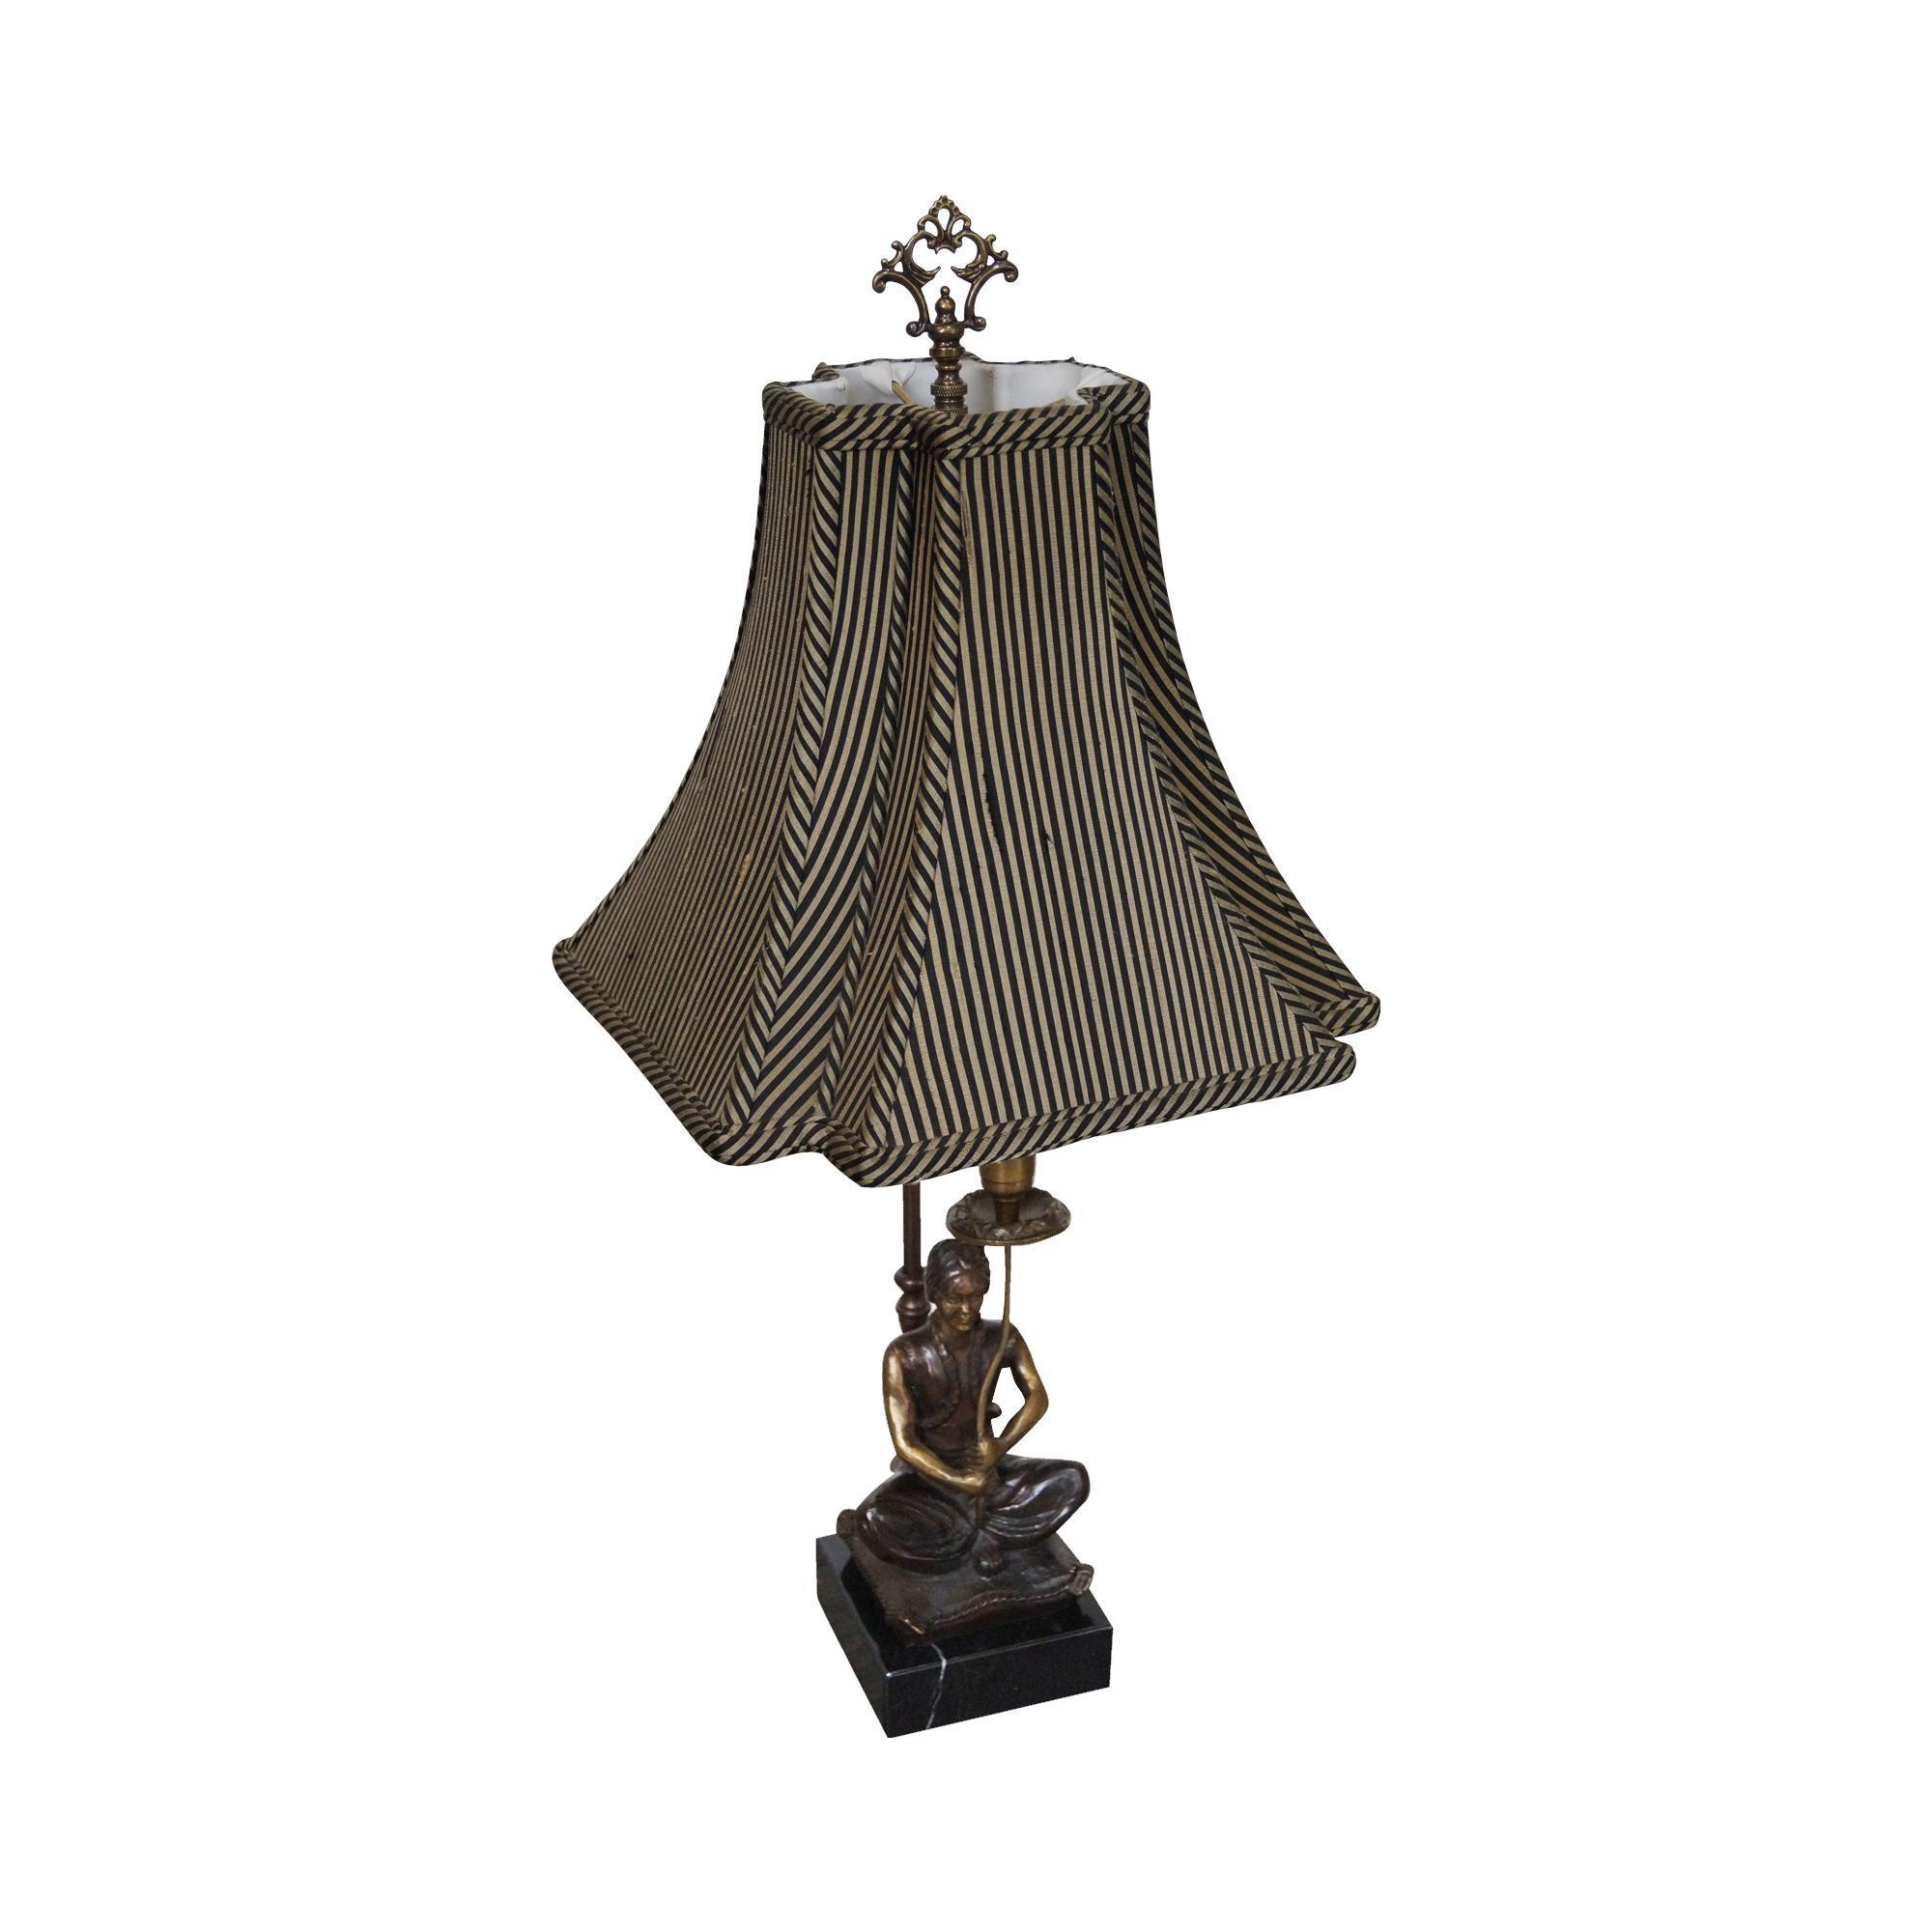 Maitland Smith Bronze Amp Marble Table Lamp Chairish